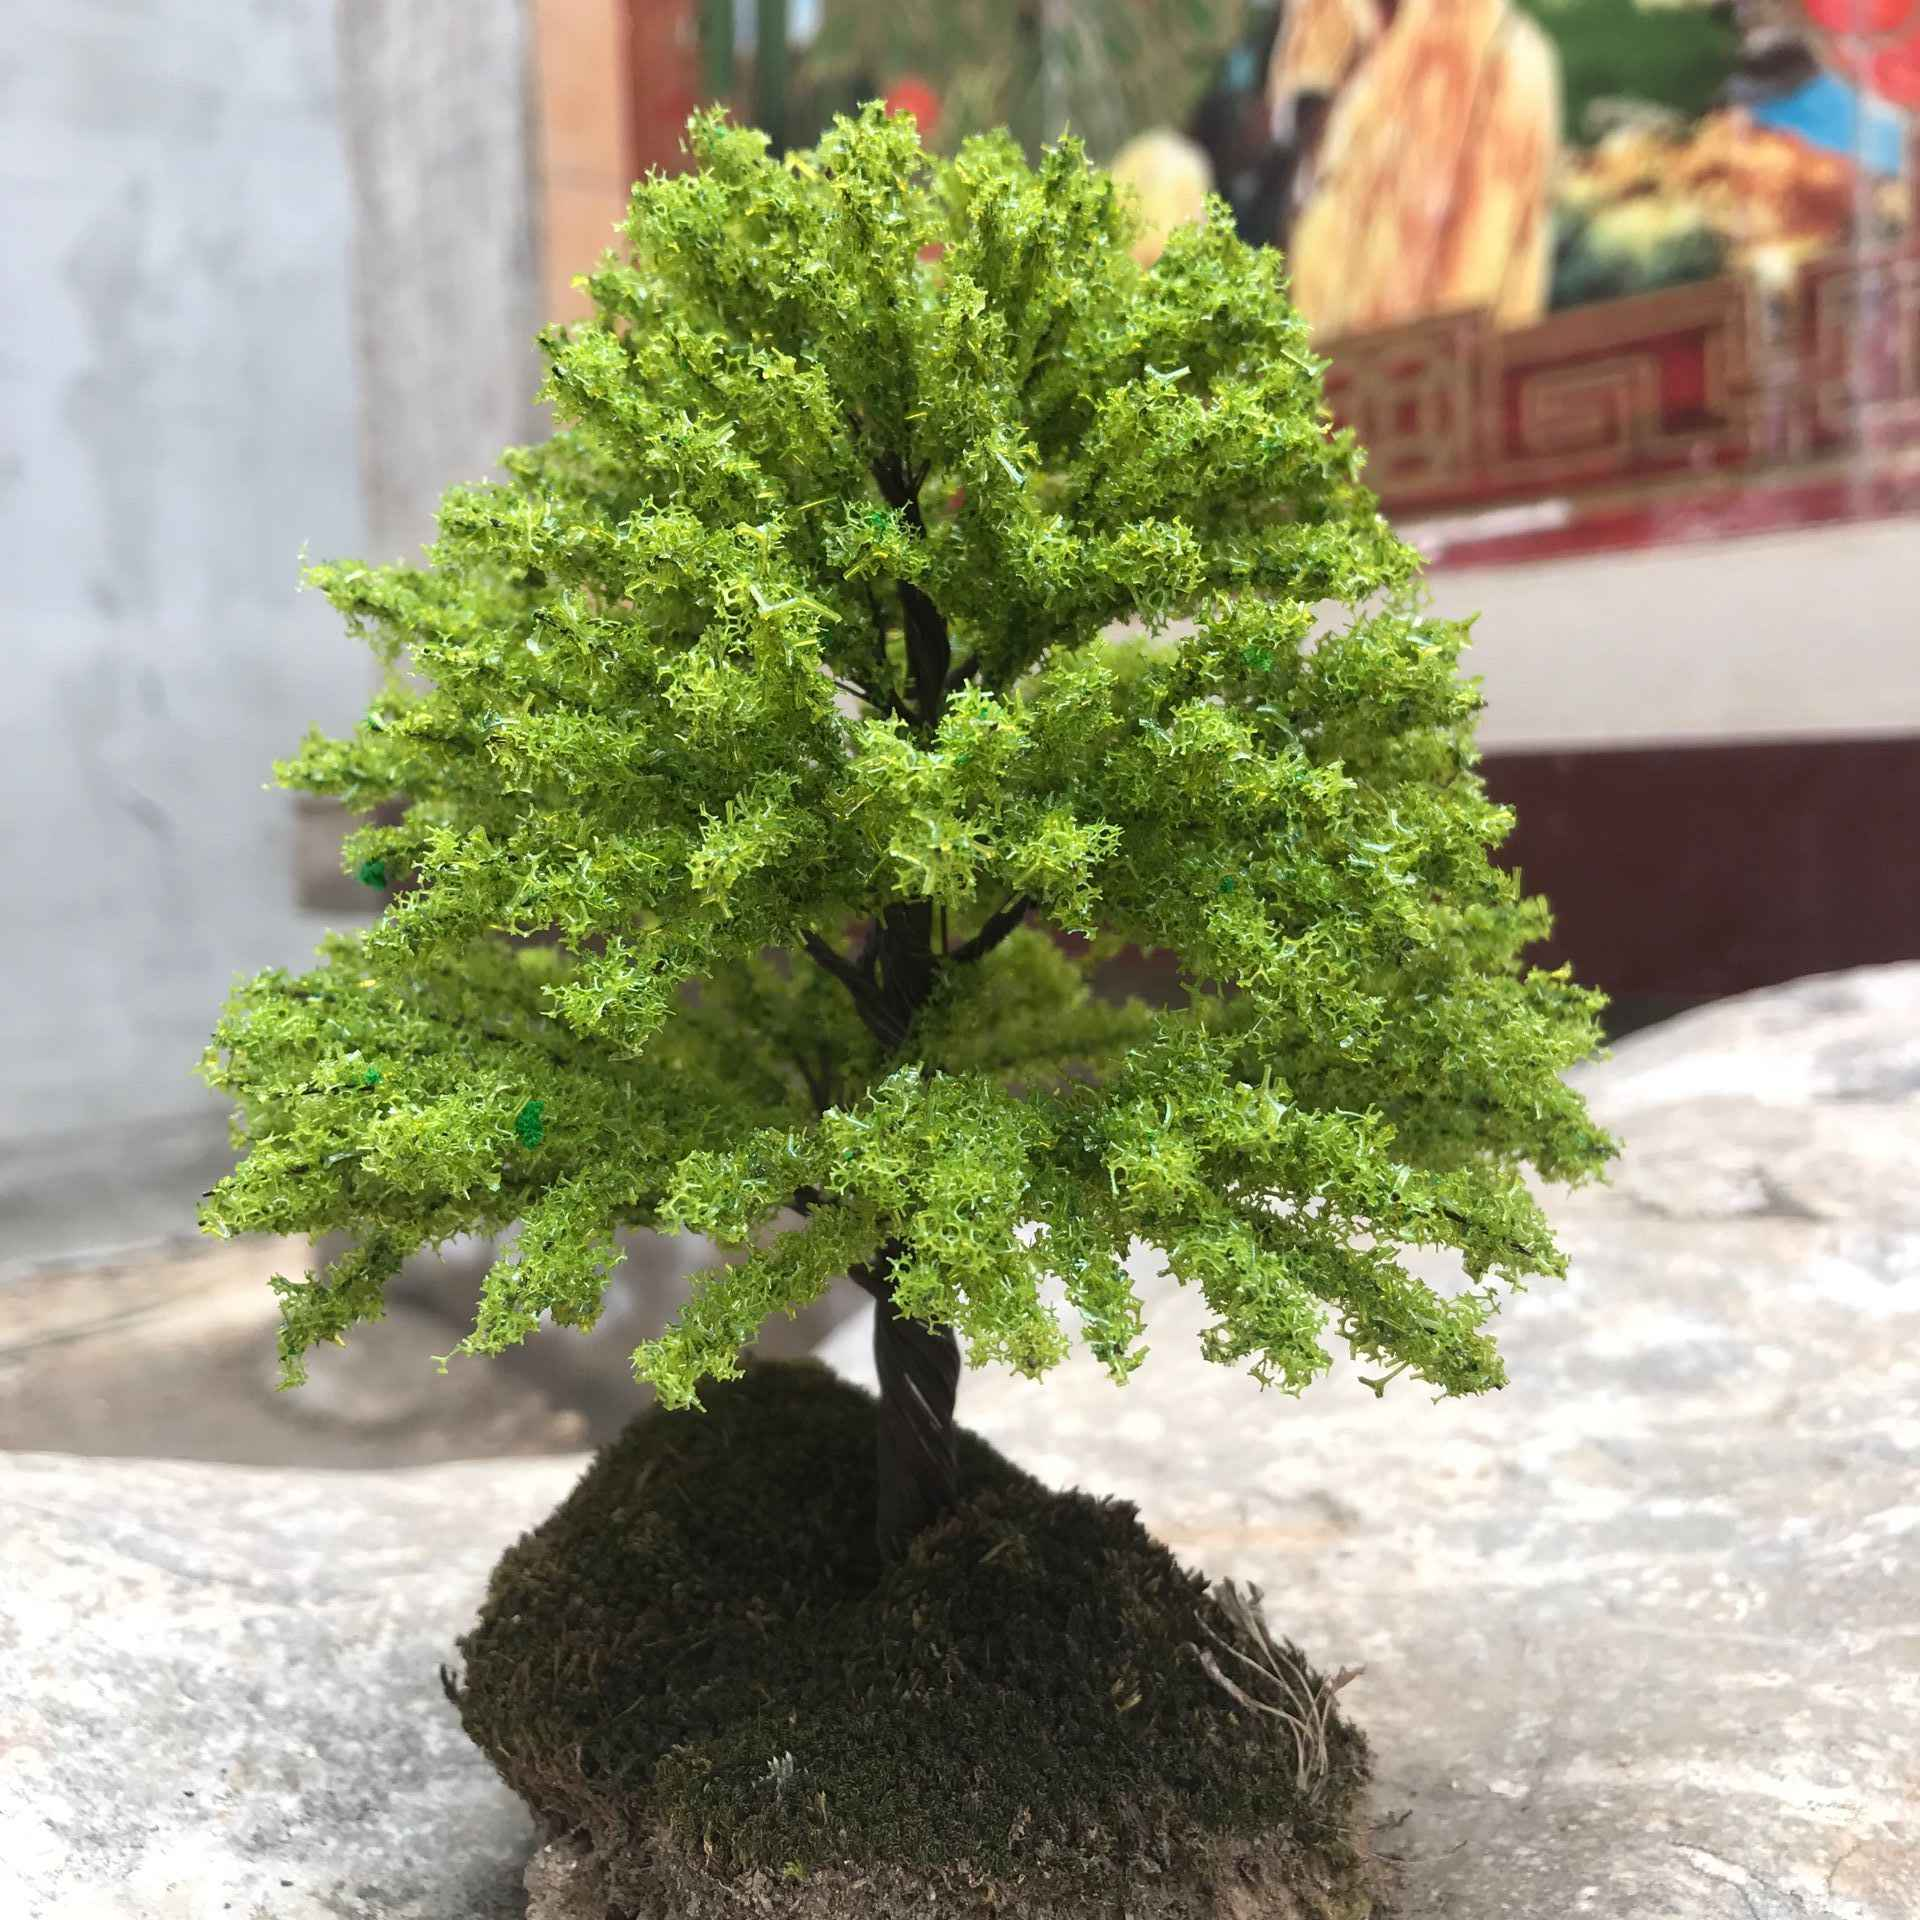 Green Model Elm Trees Bonsai Scenery Railway Wargames Miniature Landscape Decor